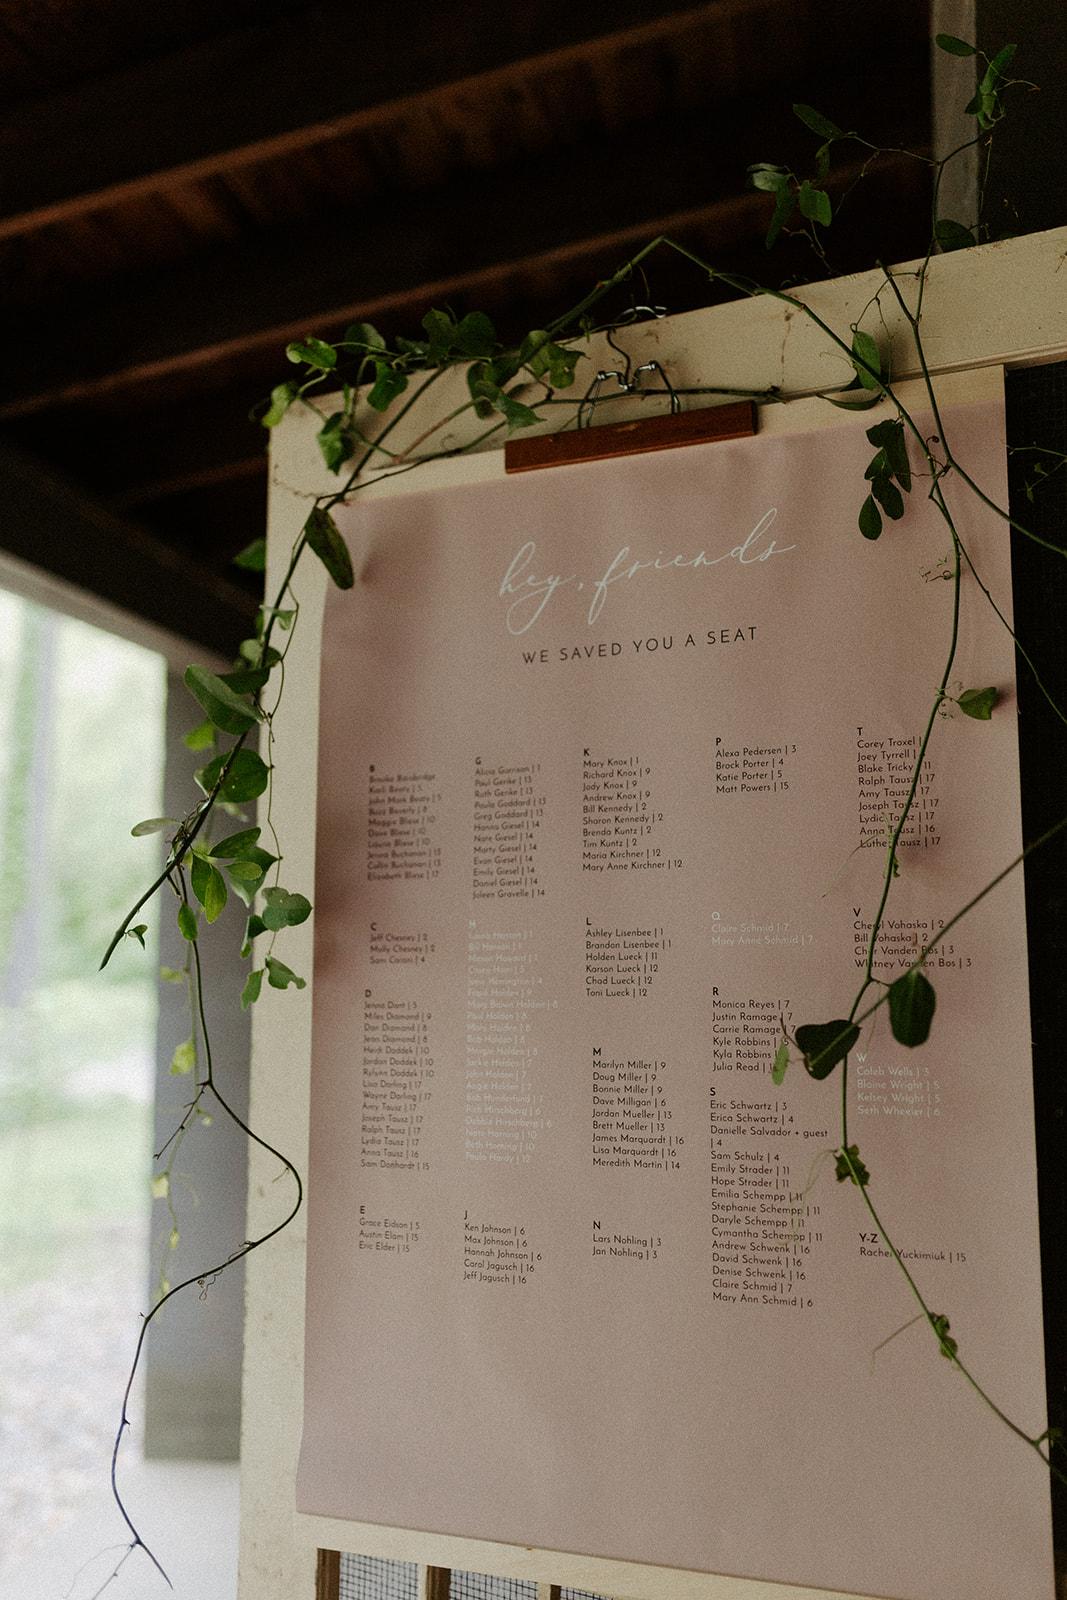 camp_wokanda_peoria_illinois_wedding_photographer_wright_photographs_bliese_0840.jpg